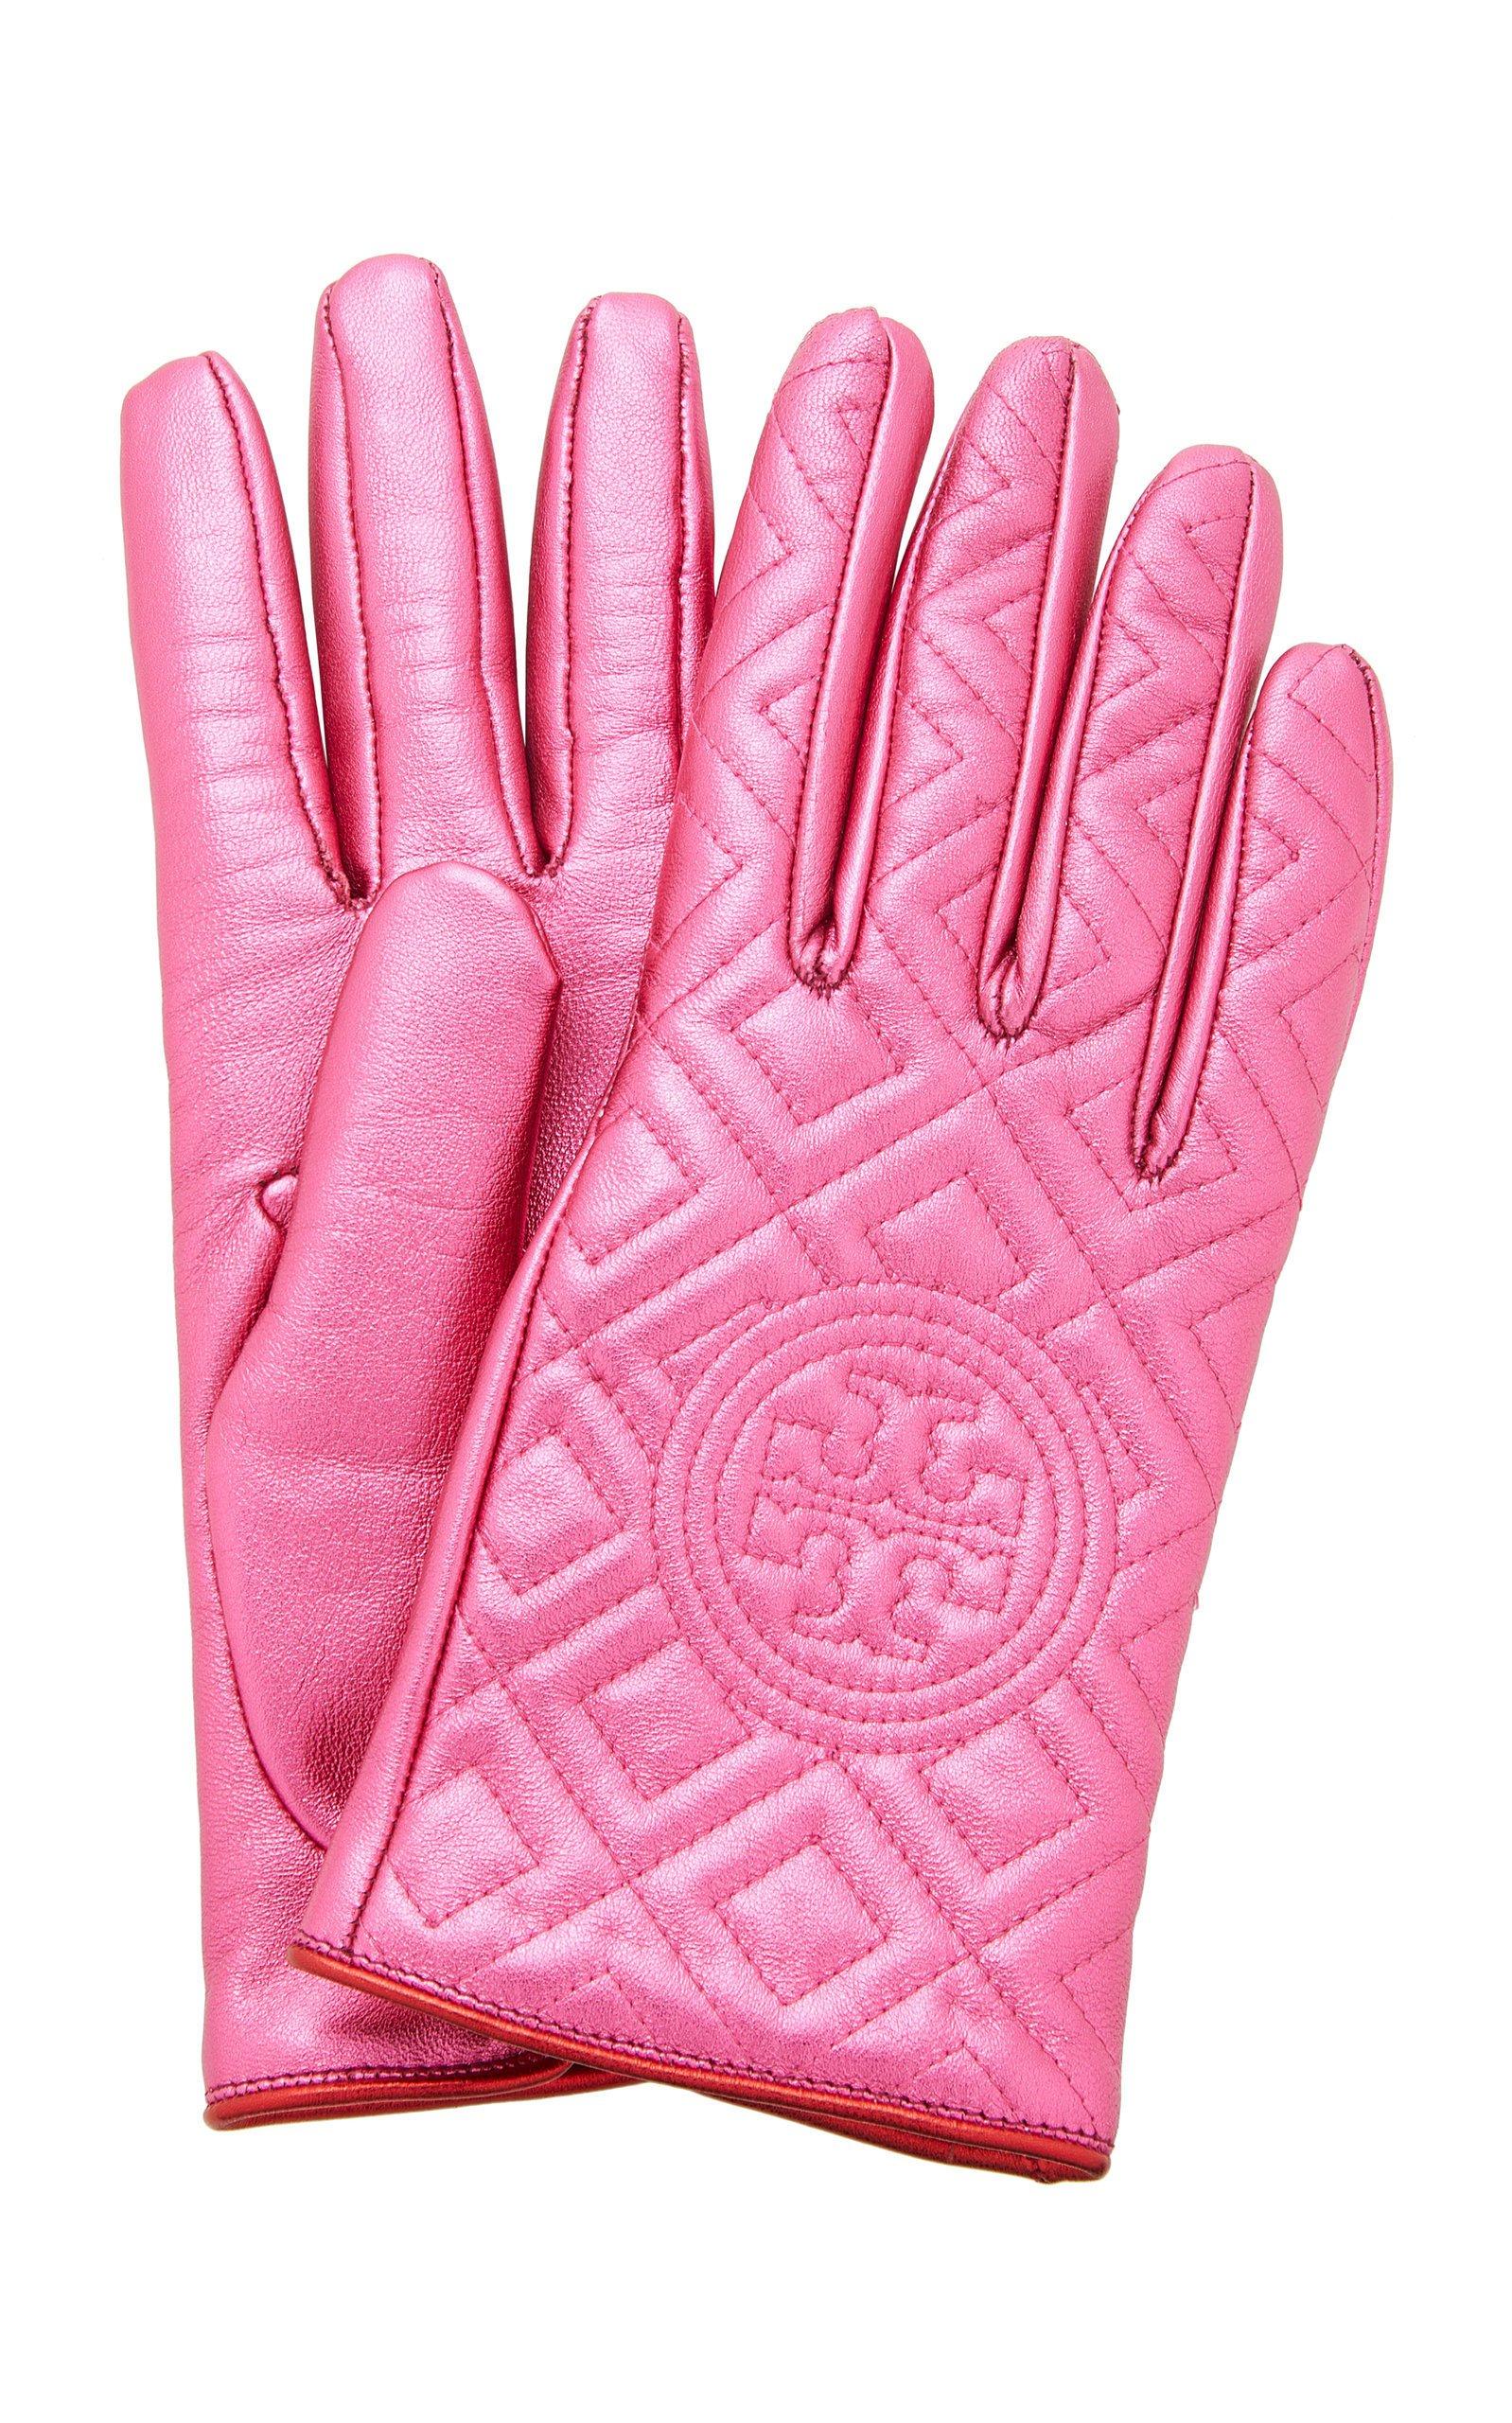 Tory Burch Fleming Metallic Gloves